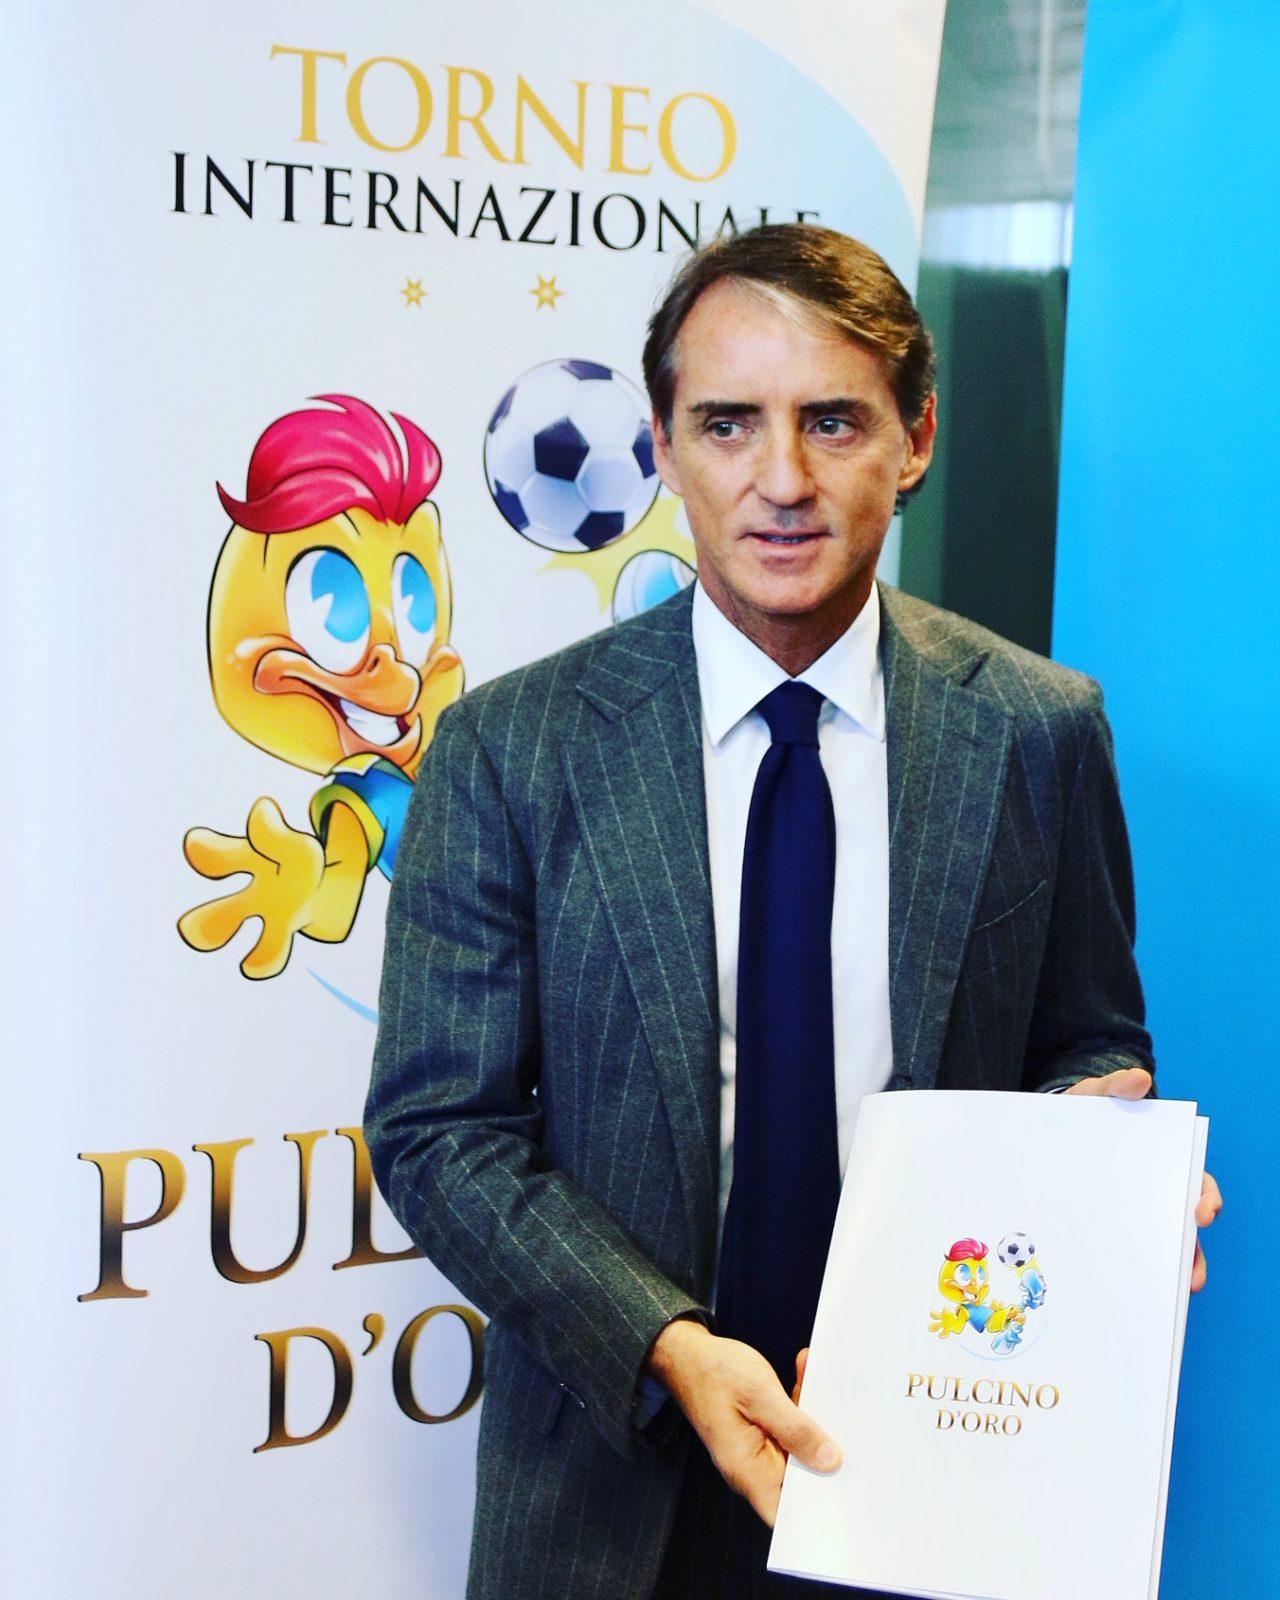 Mancini-Pulcino-1280x1600.jpg